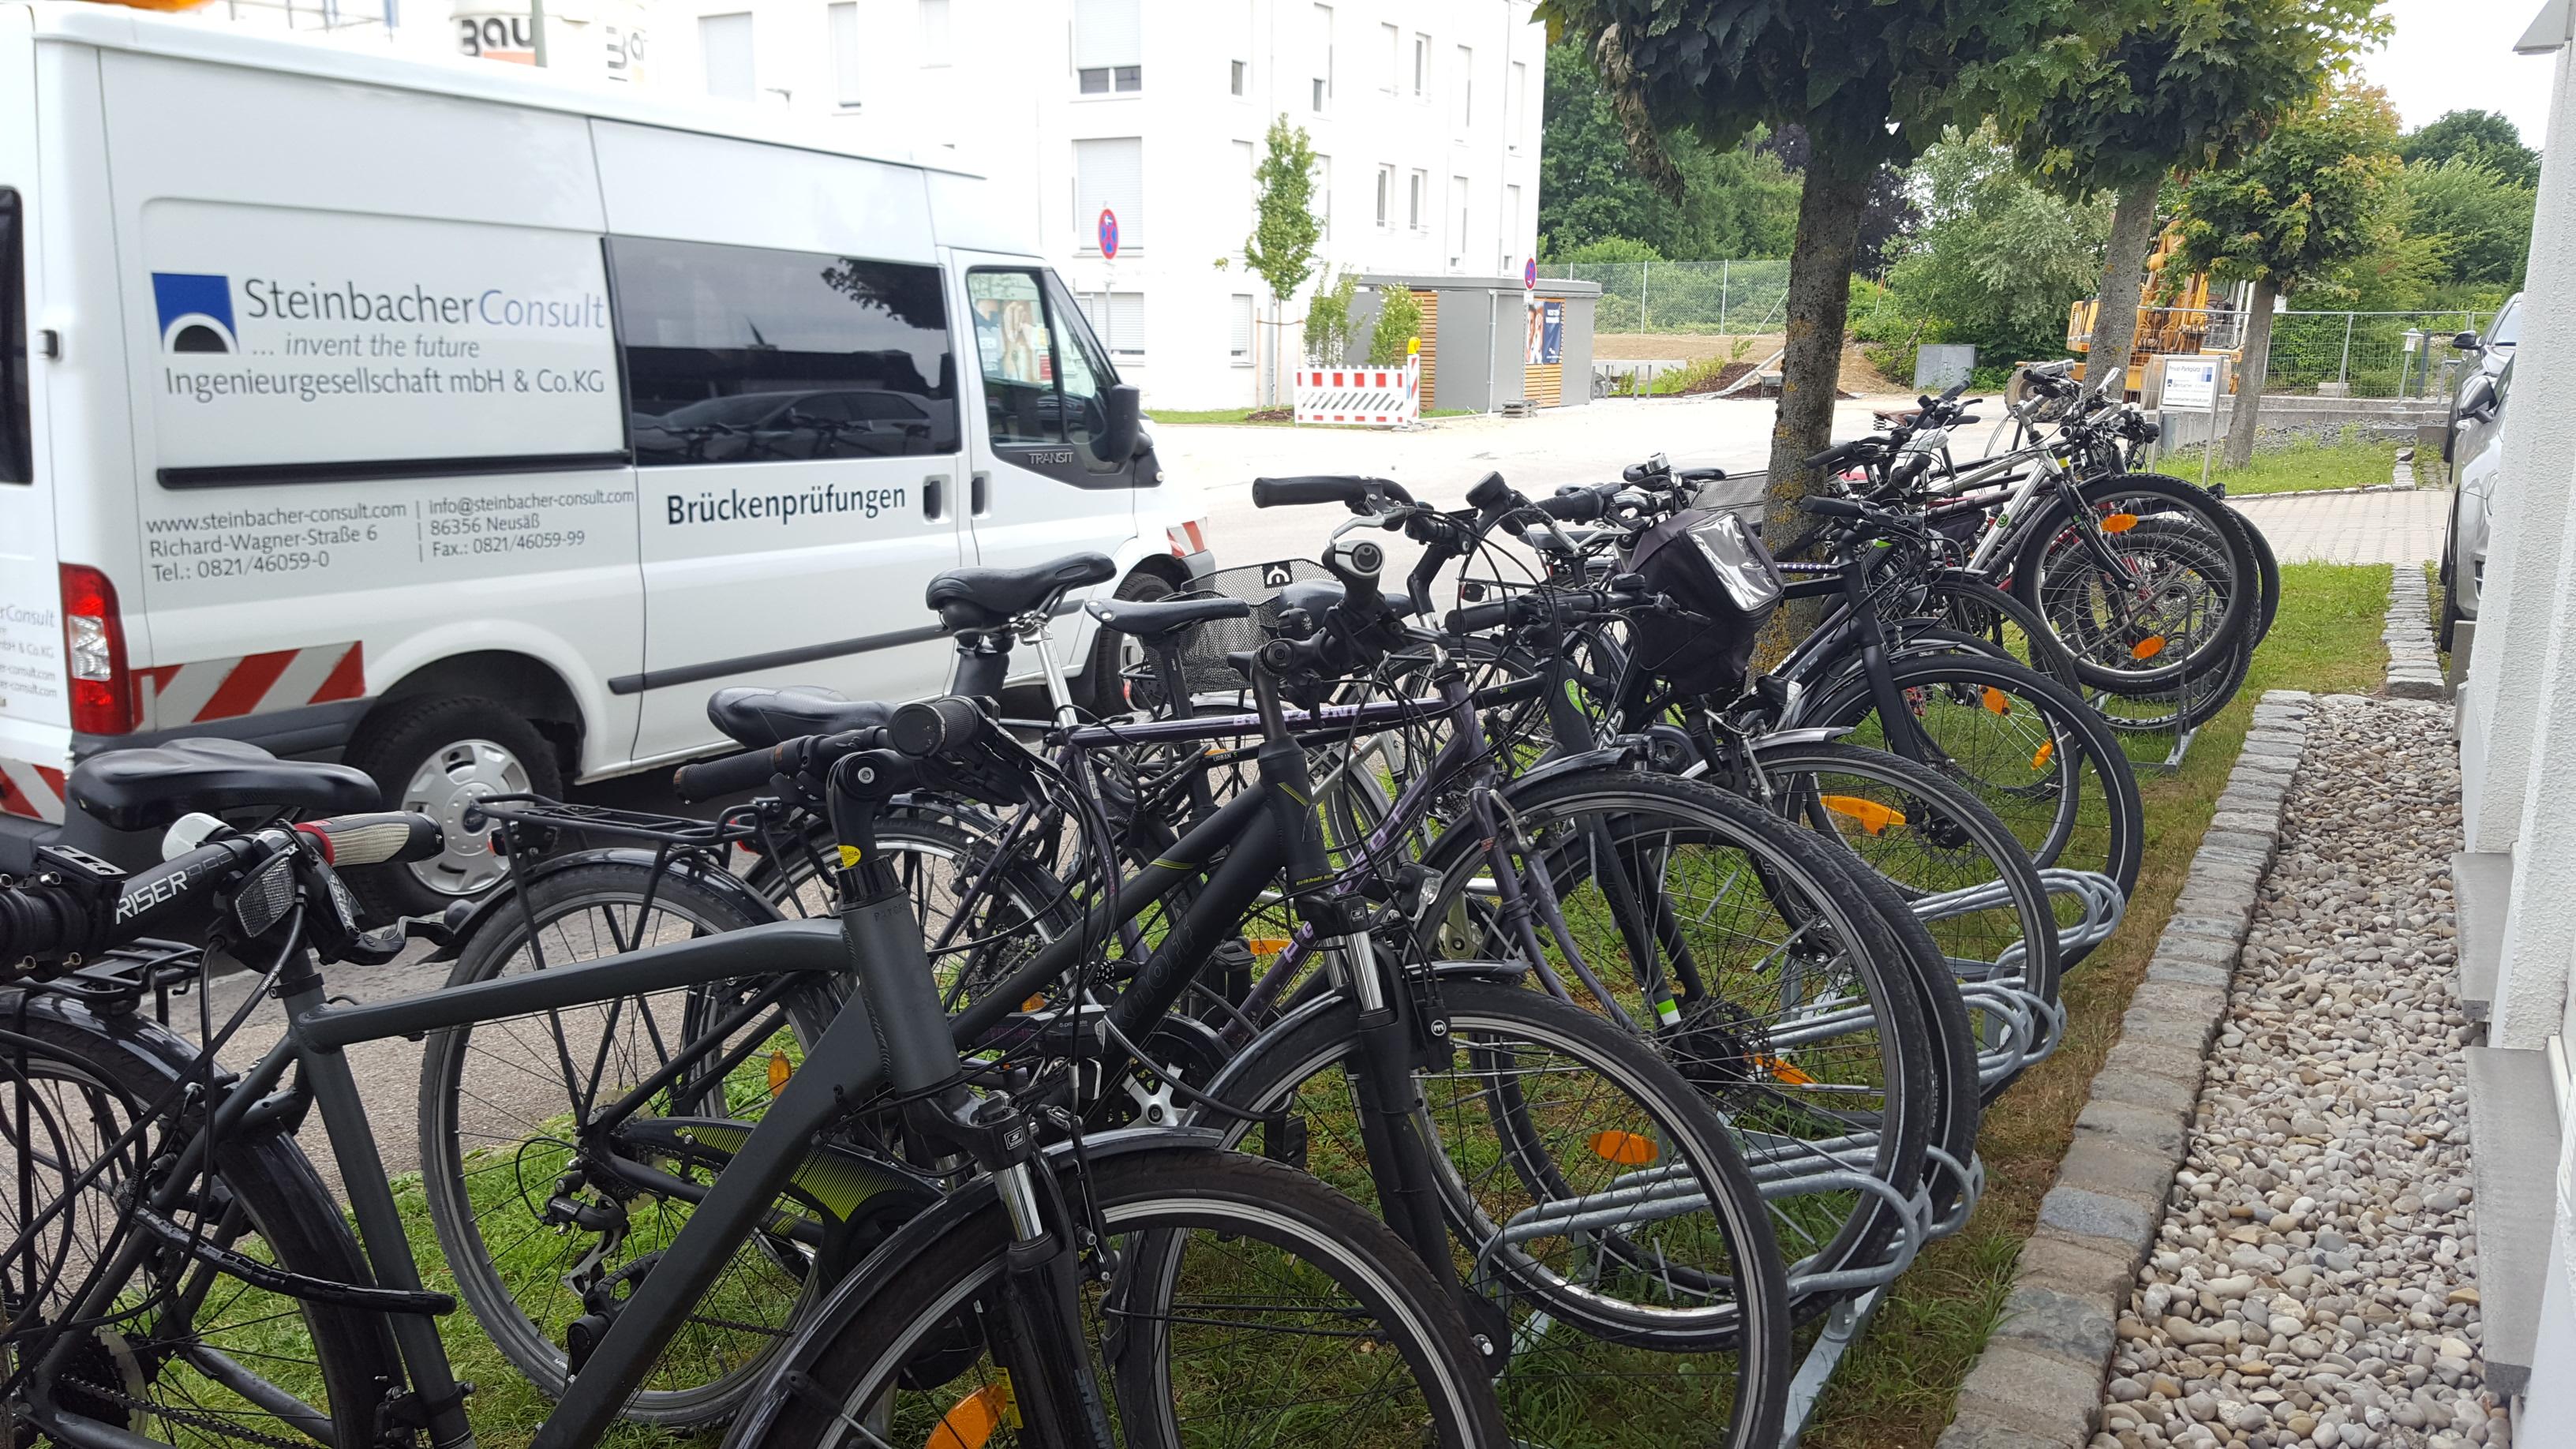 Steinbacher-Consult Stadtradeln